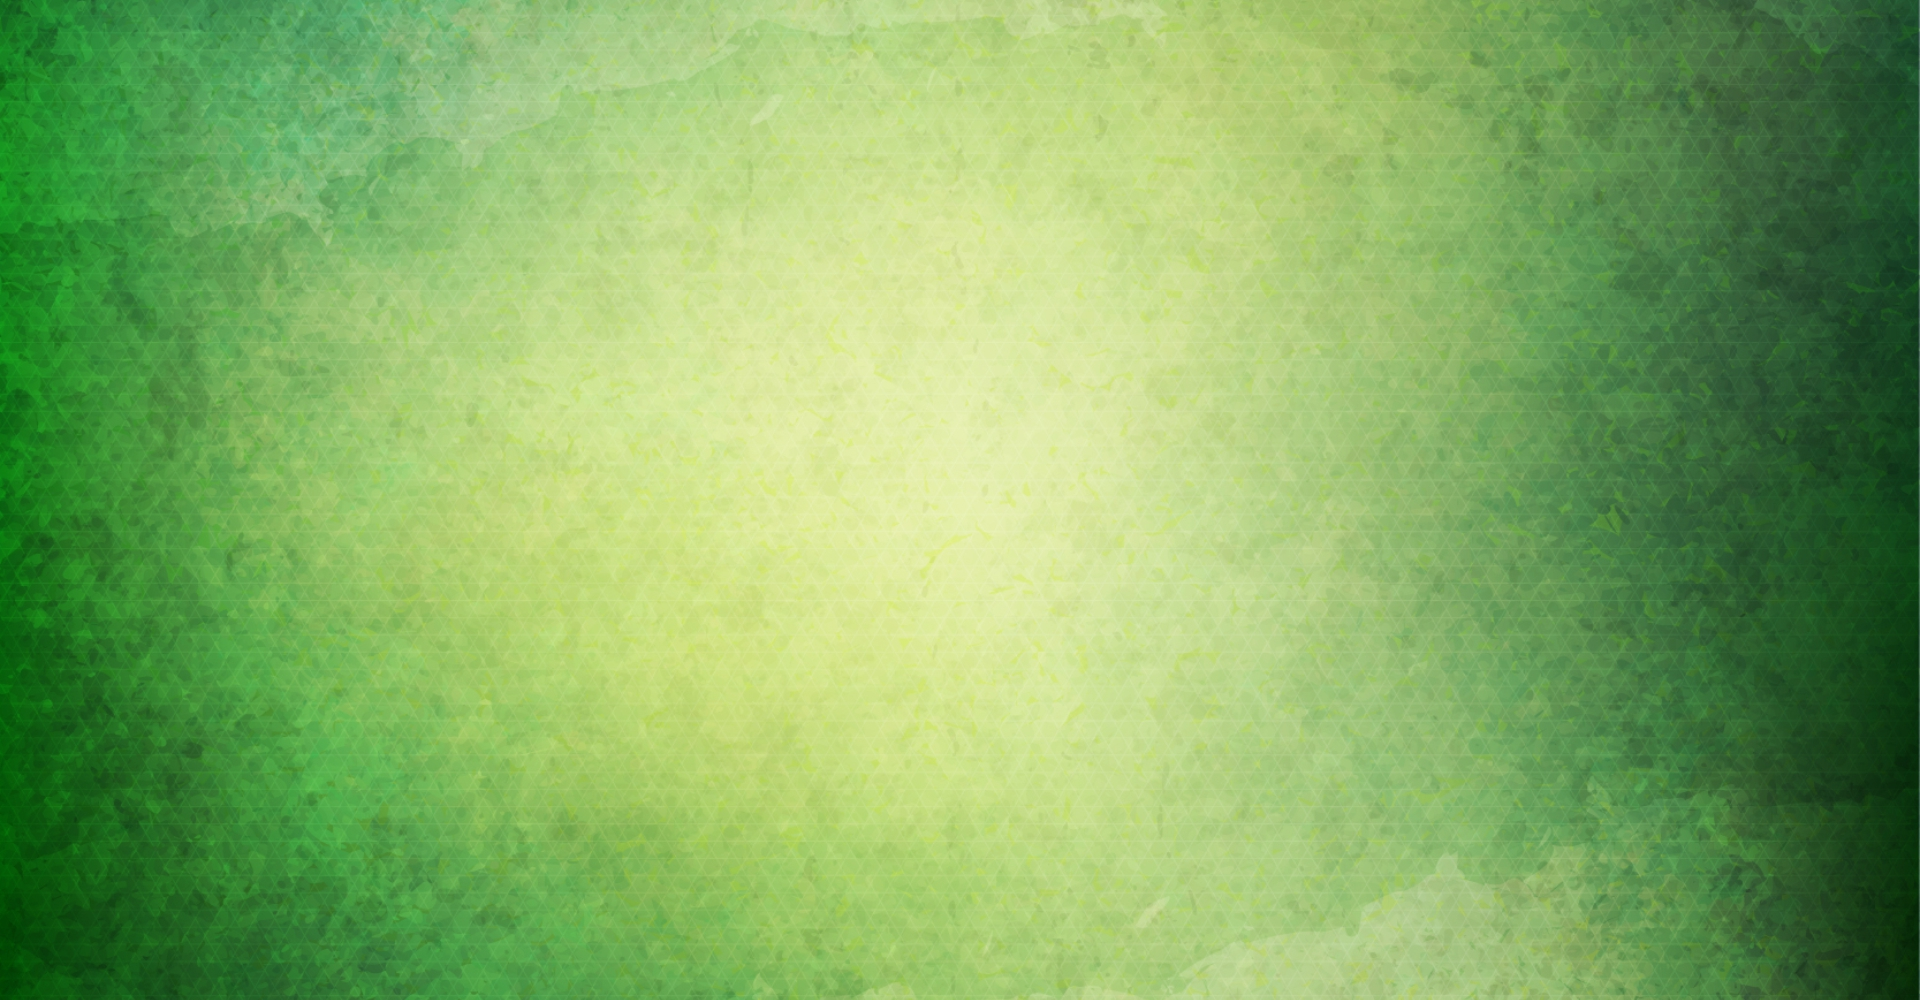 fundo-de-tela-verde-para-pagina-de-distribuicao-grandha